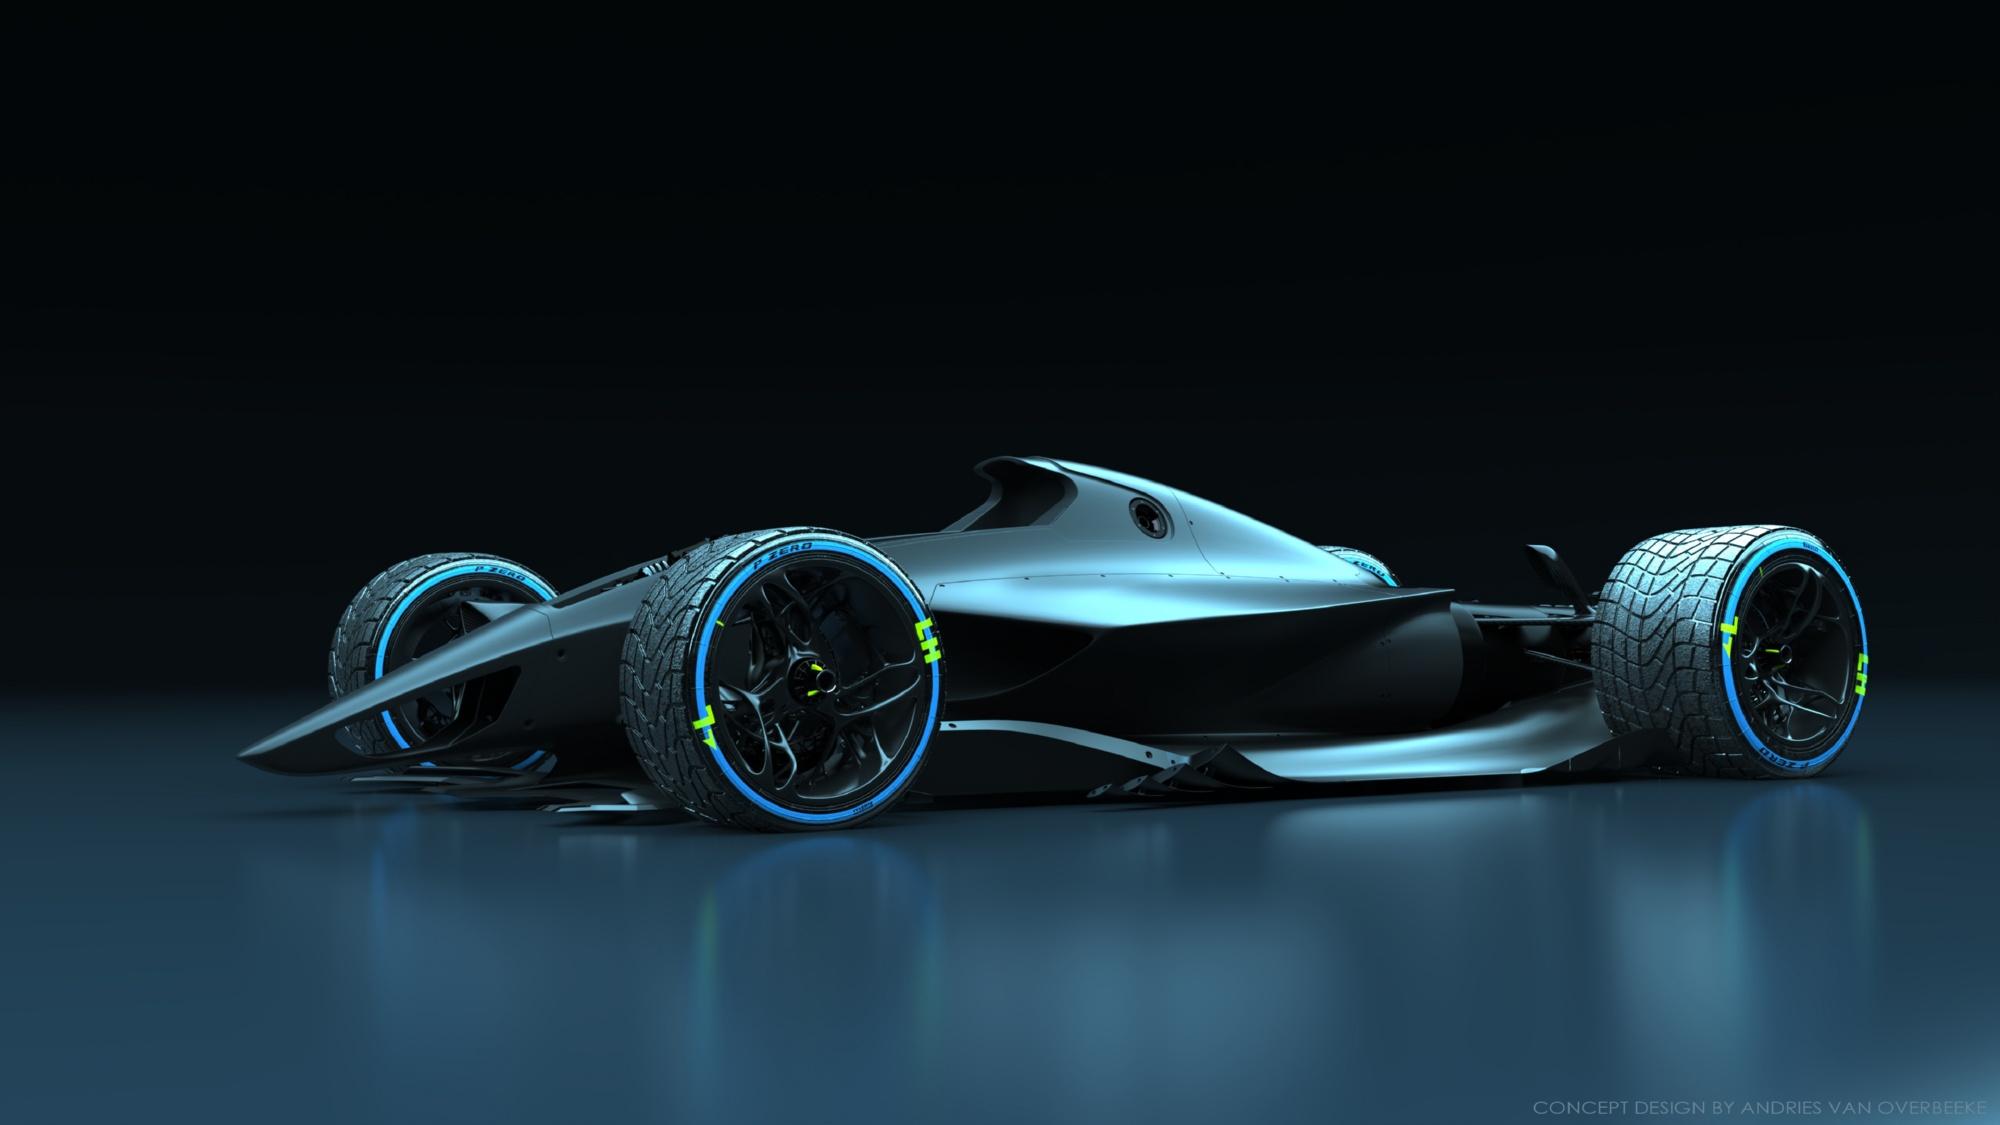 Formula 1 Future Concept by Andries van Overbeeke